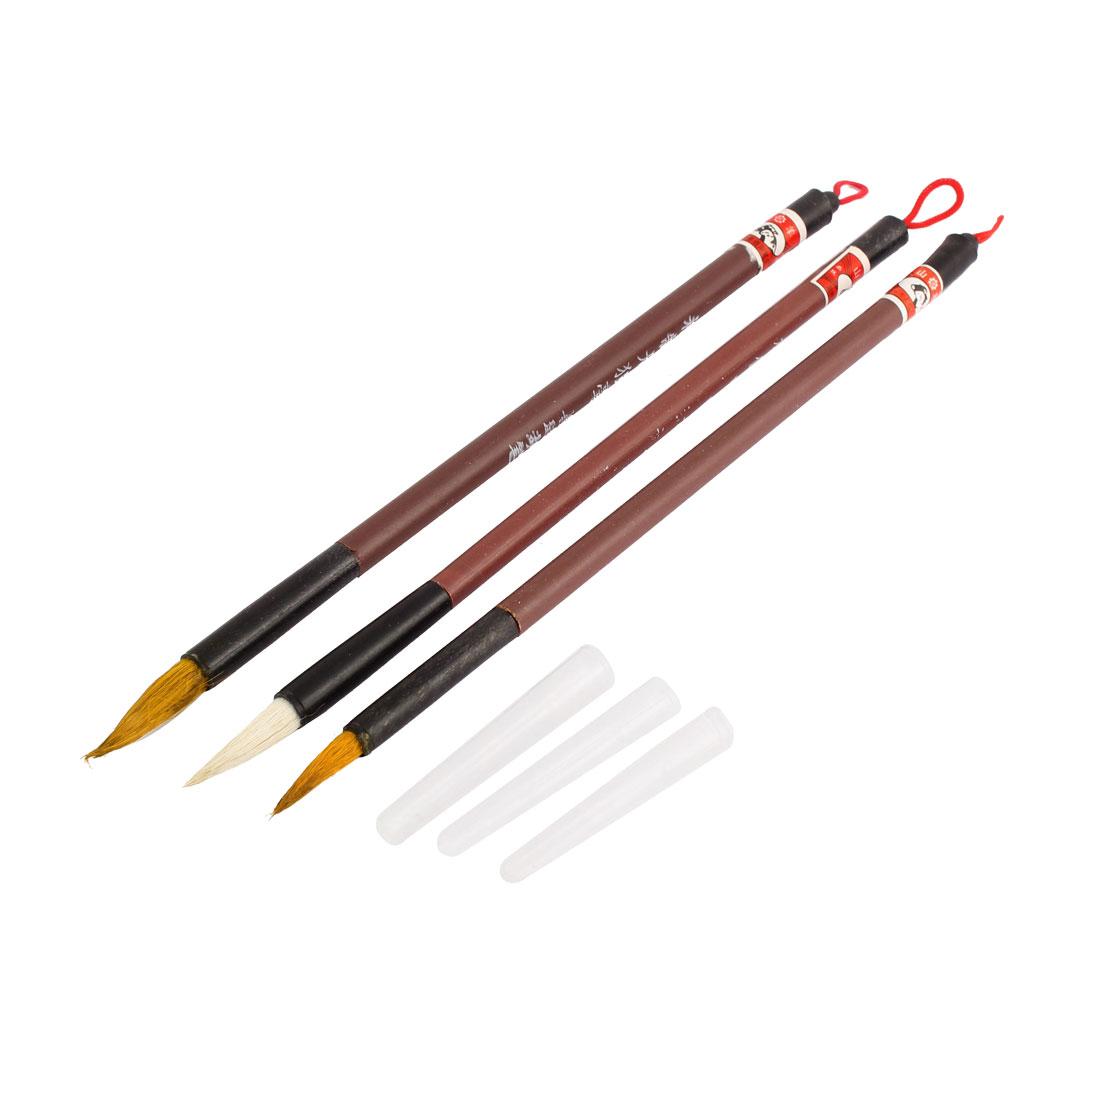 3 Pcs Painting Writing Plastic Shaft Chinese Brush Small Size w String